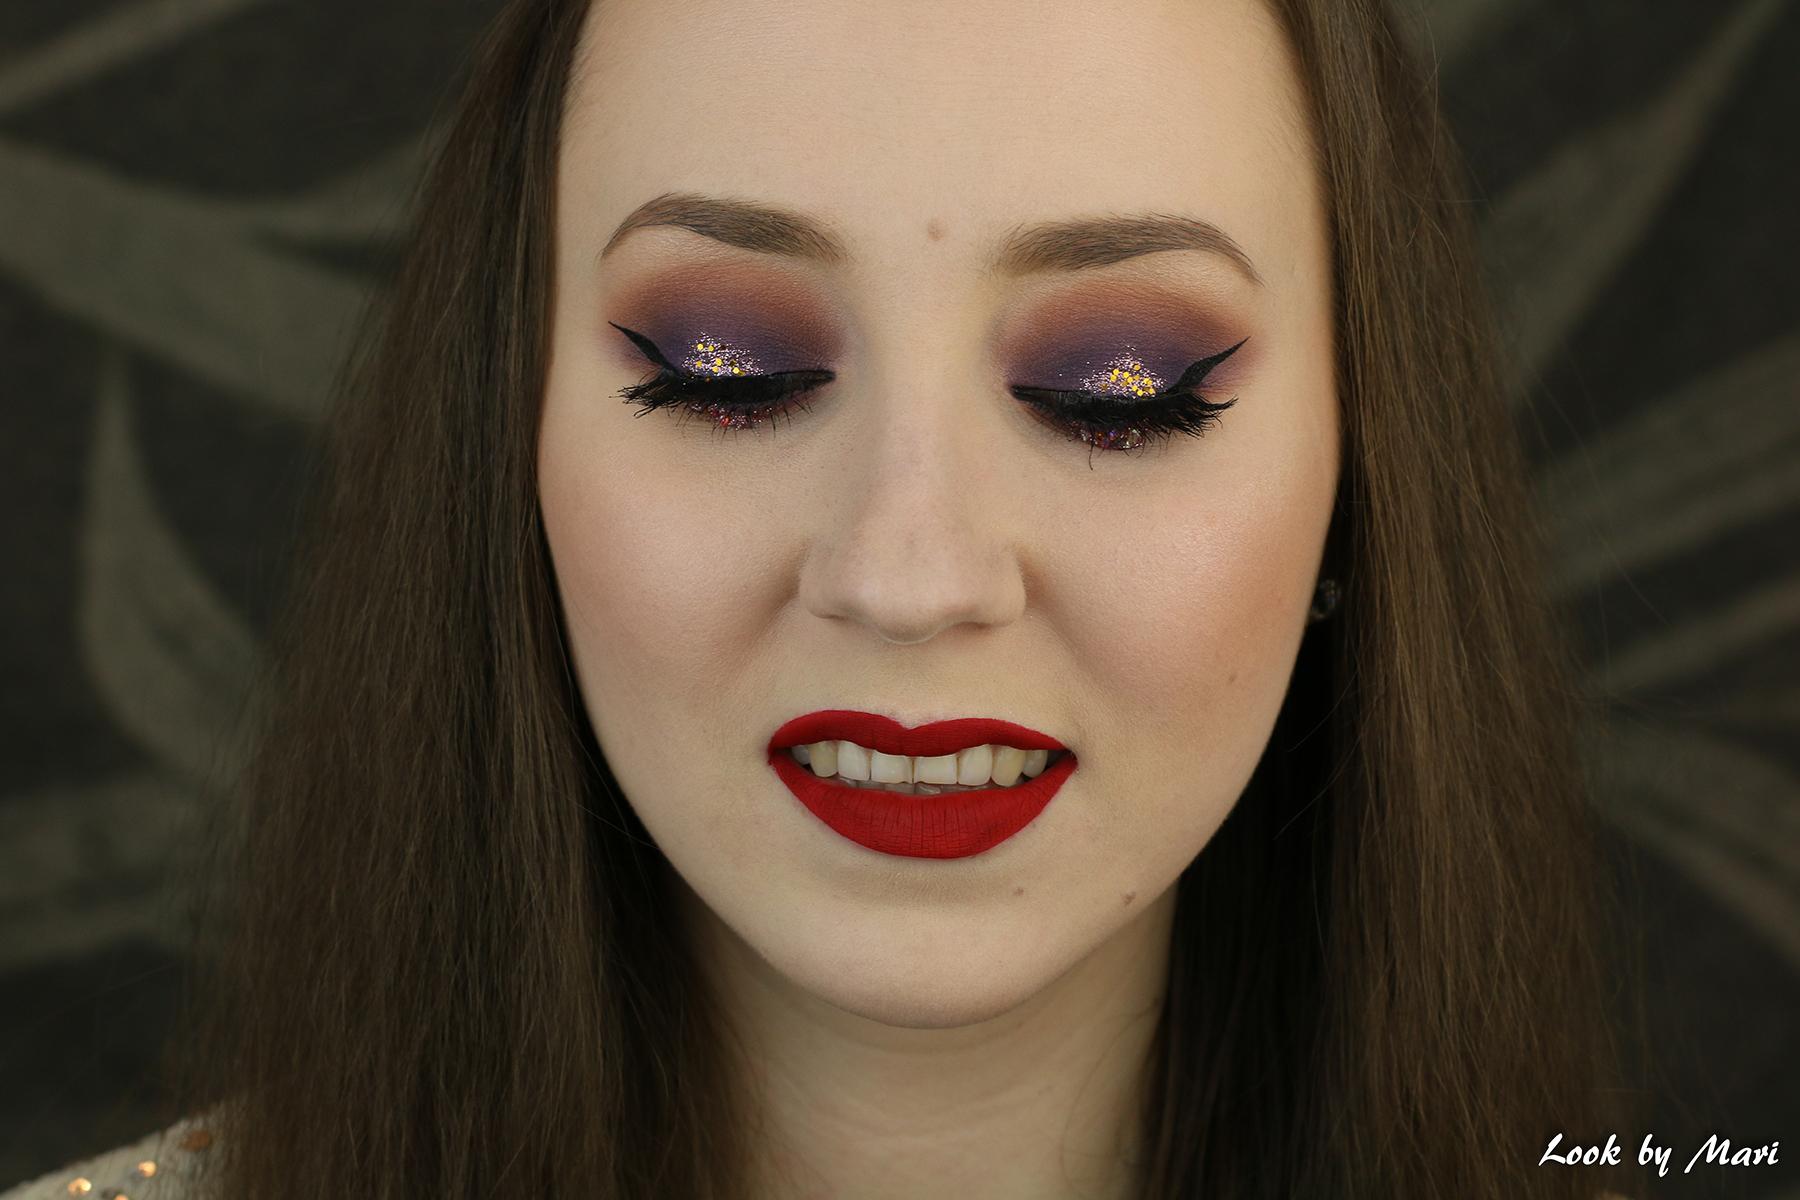 2 lilac violet eye makeup inspiration inspo ideas tutorial blog